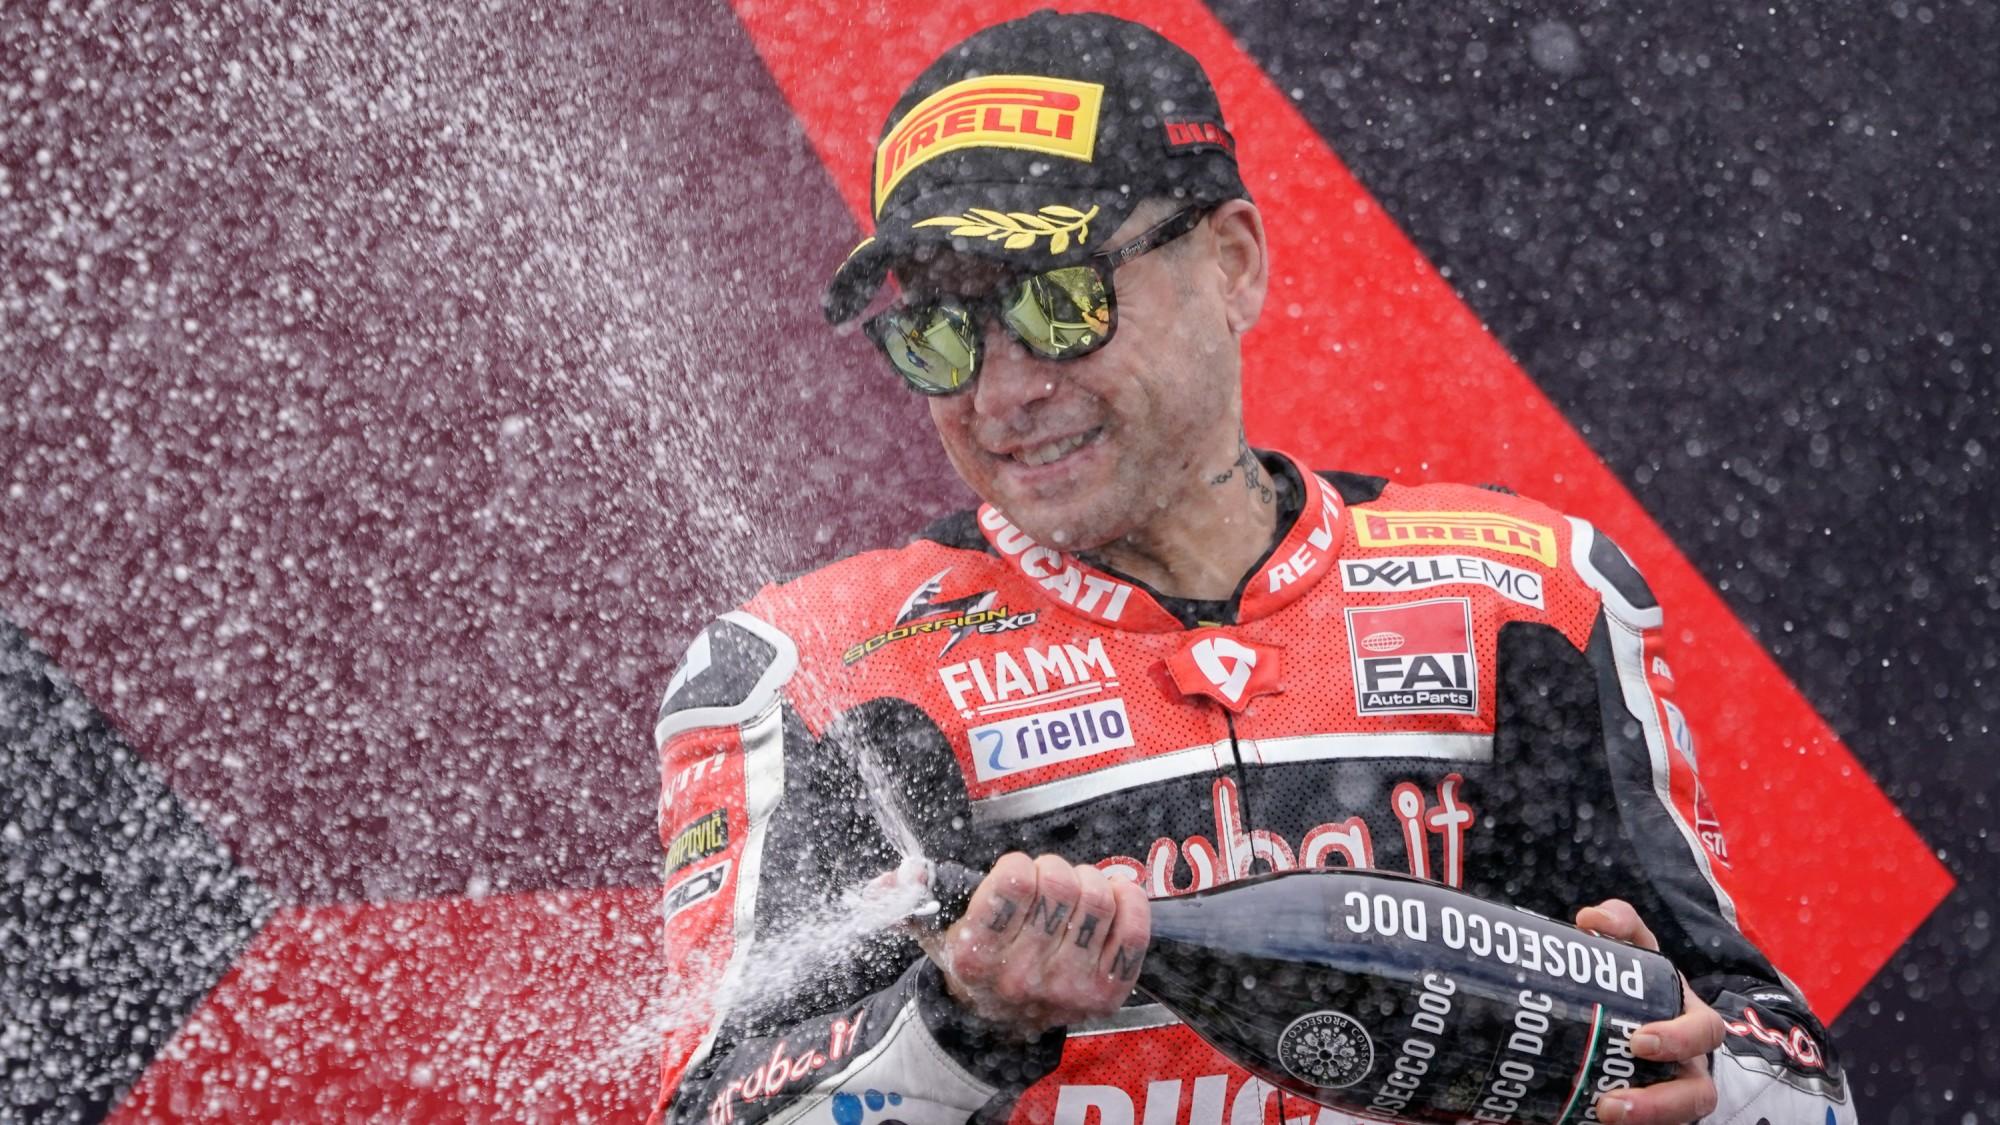 WSBK 2019 Motocard Aragon Round_4